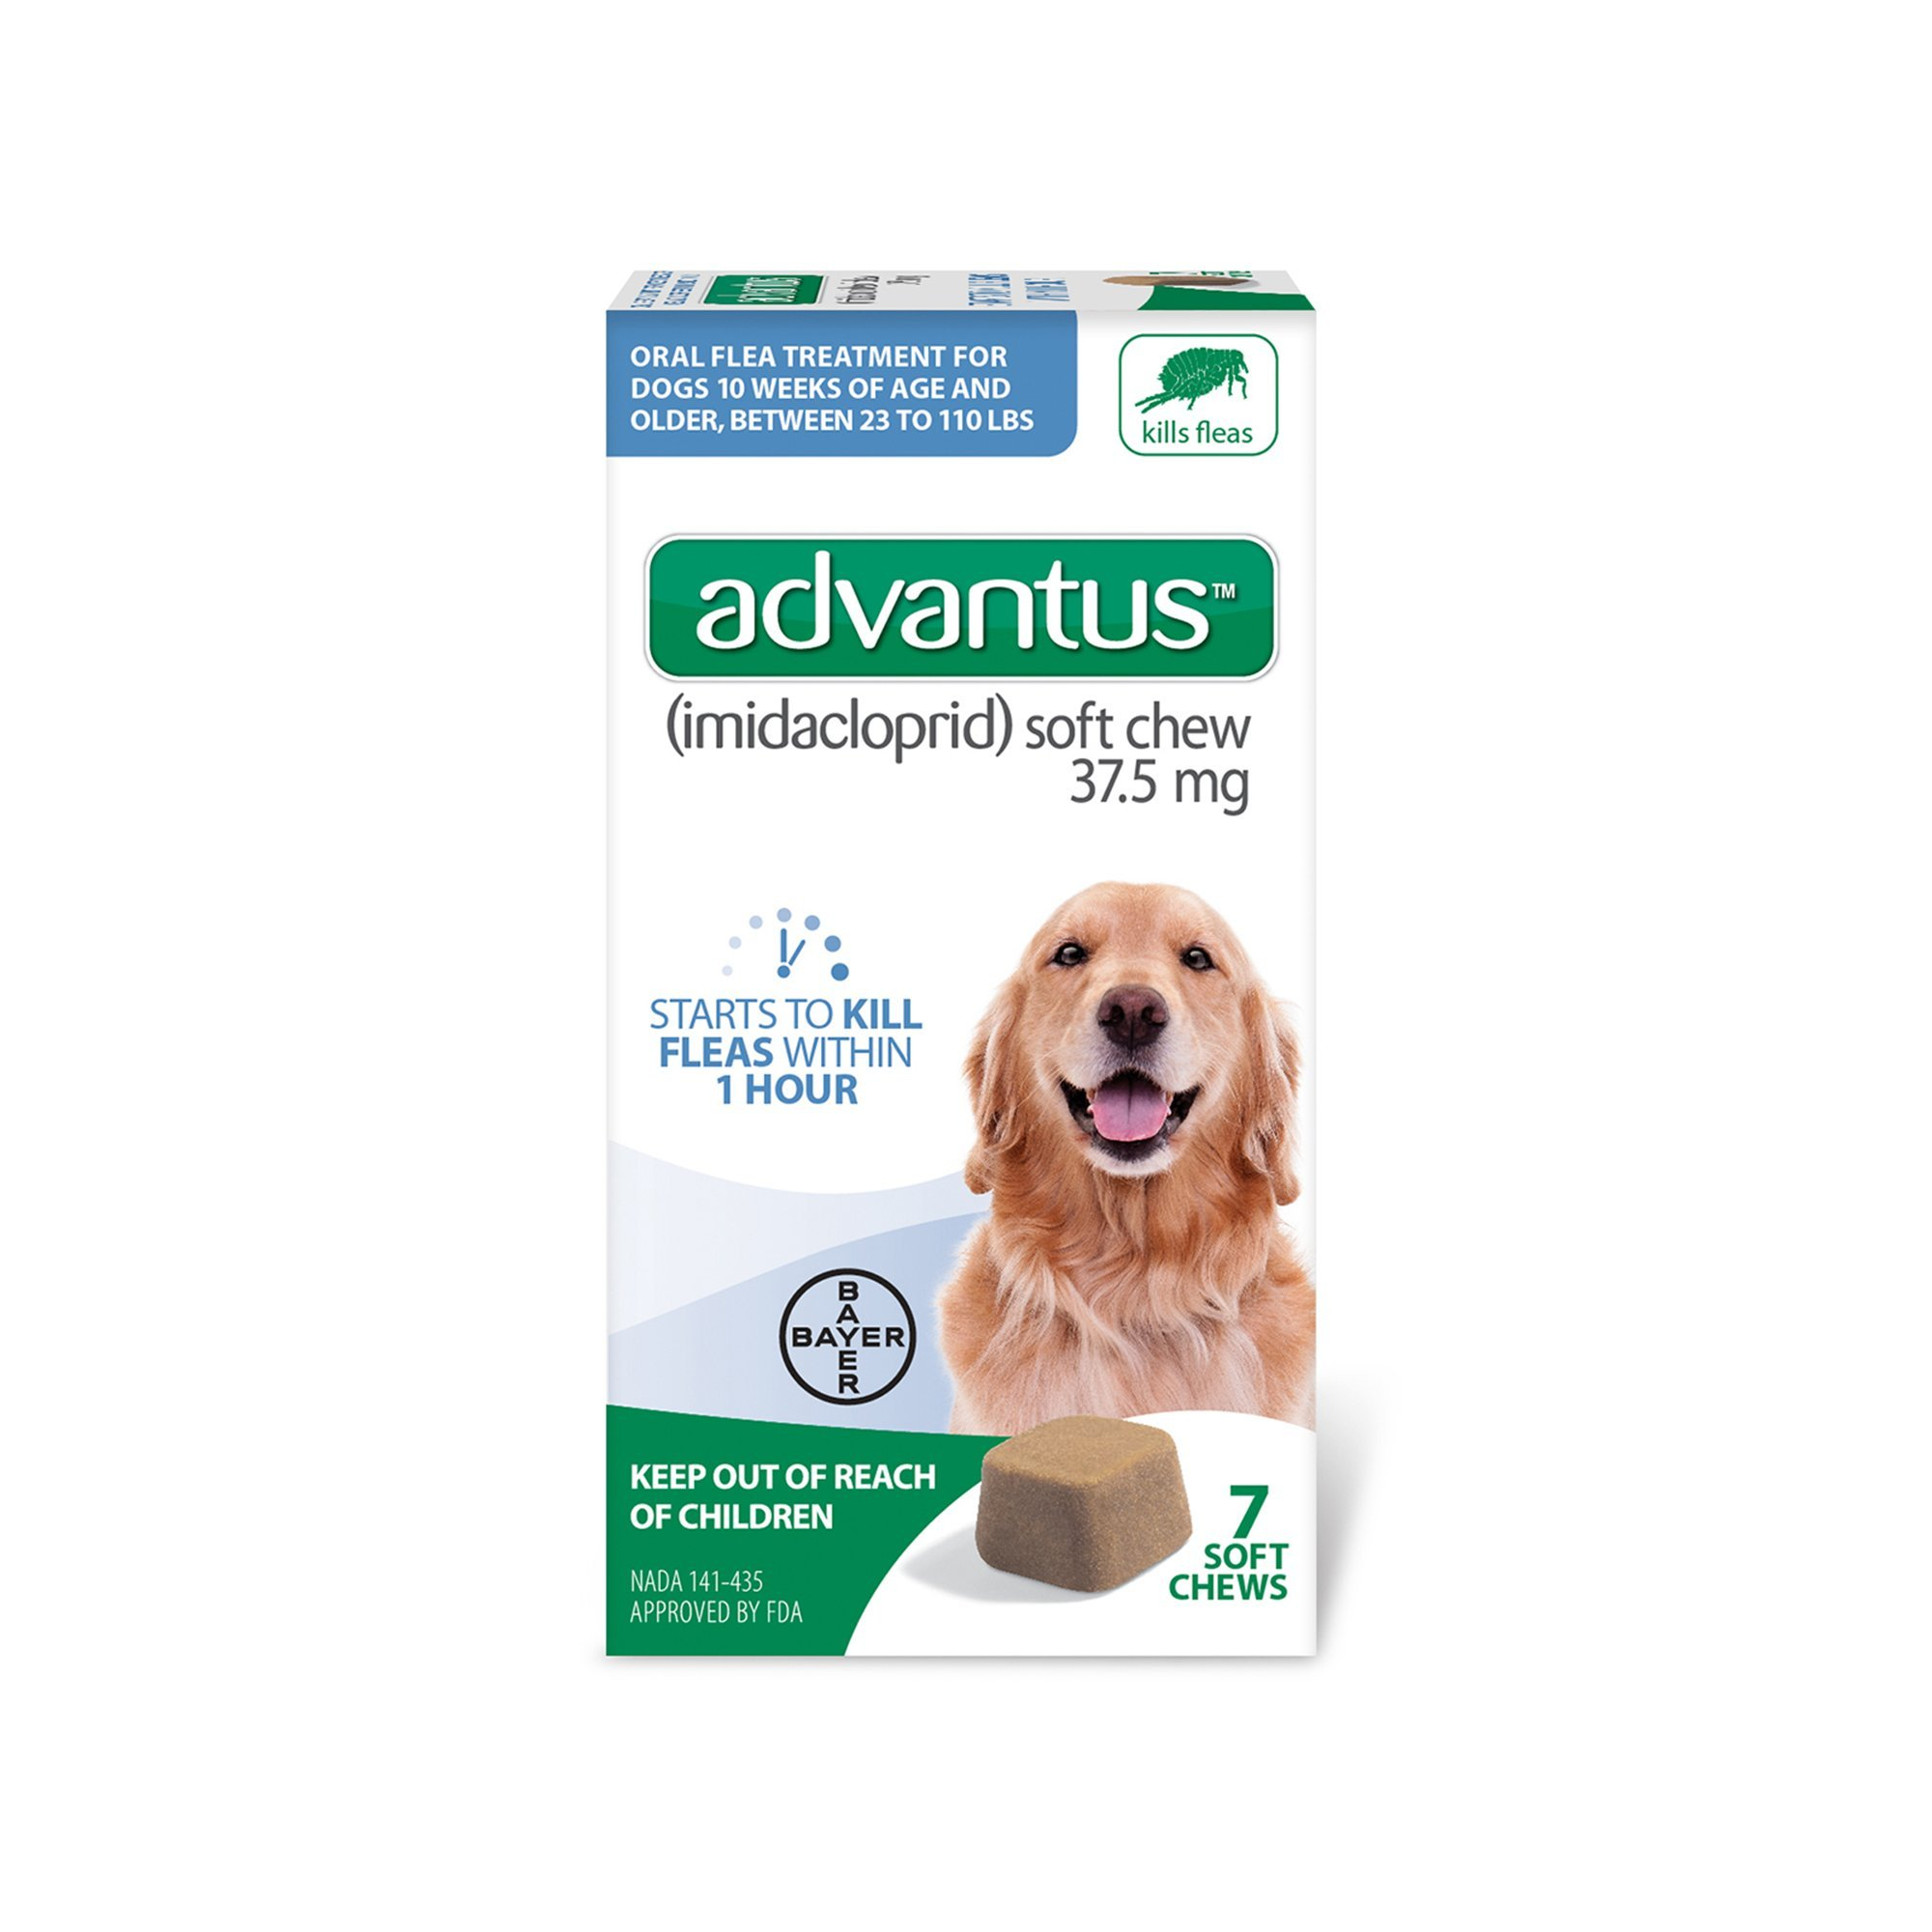 Advantus Flea Soft Chews for Large Dogs 23-110lbs, 7 count